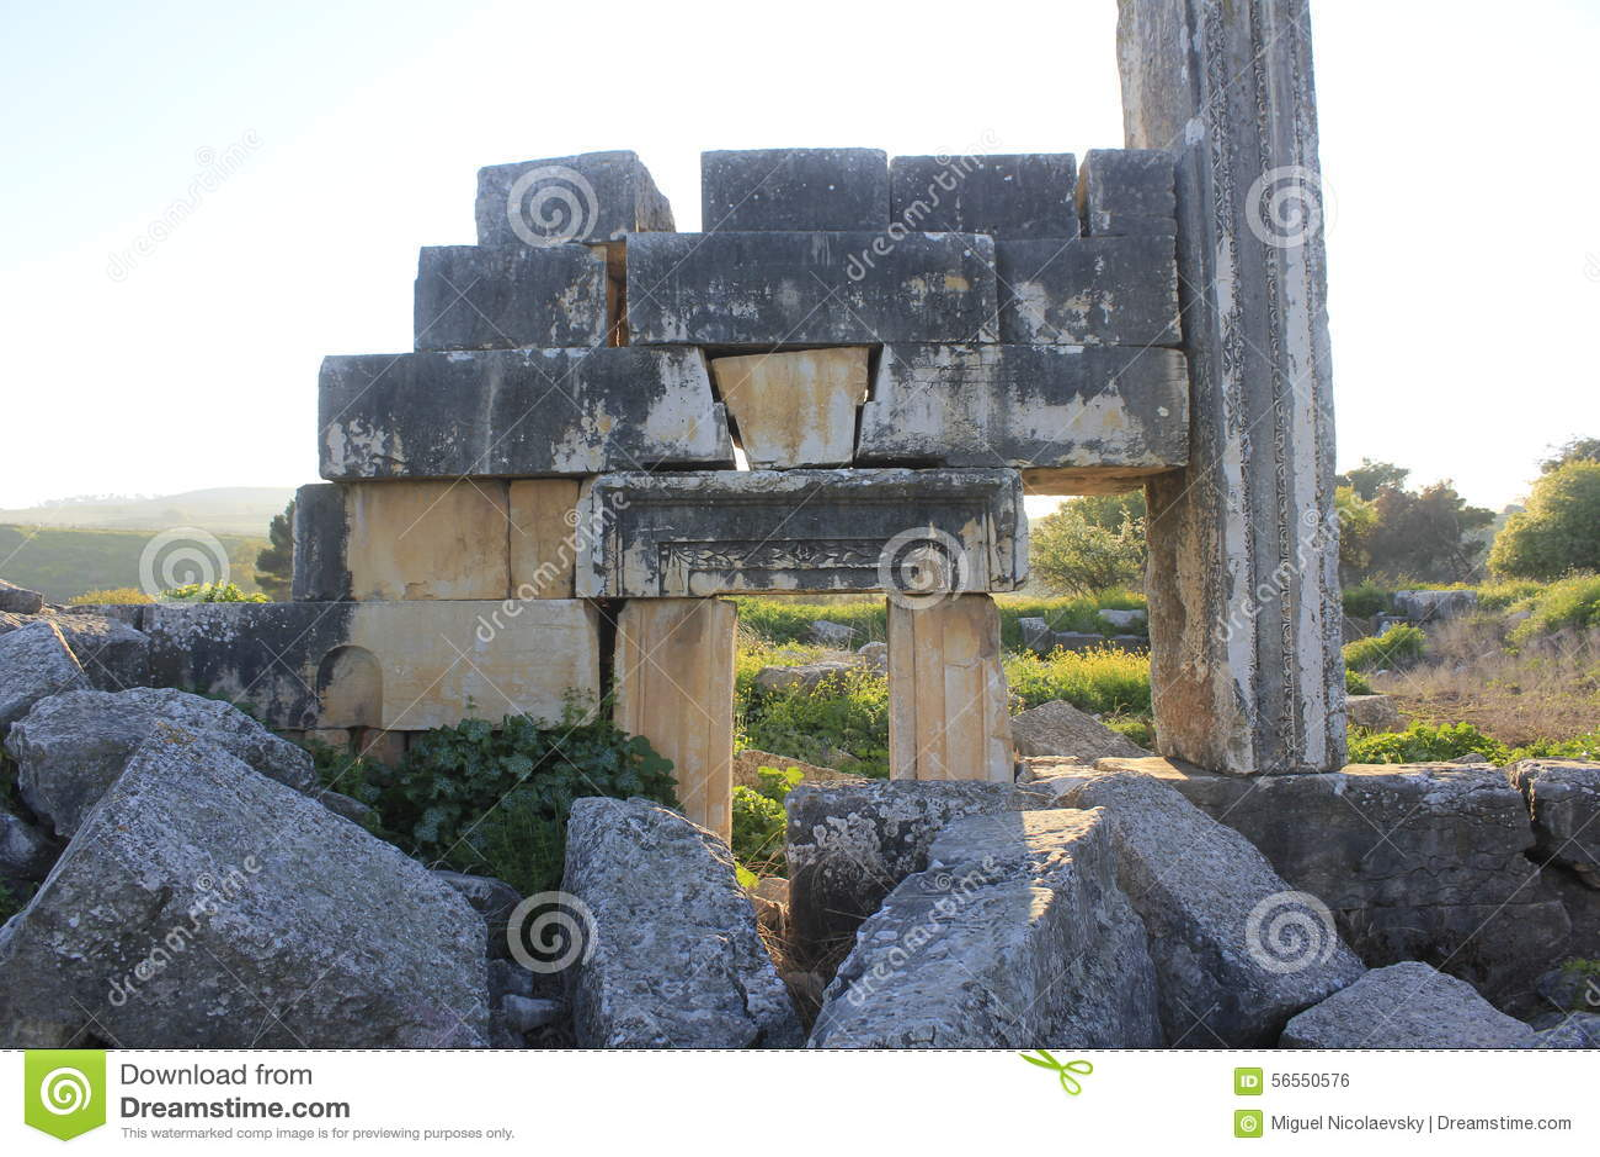 Download Καταστροφές της αρχαίας πόλης βιβλικού Kedesh στο Ισραήλ Στοκ Εικόνες - εικόνα από ιστορικός, εποχή: 56550576